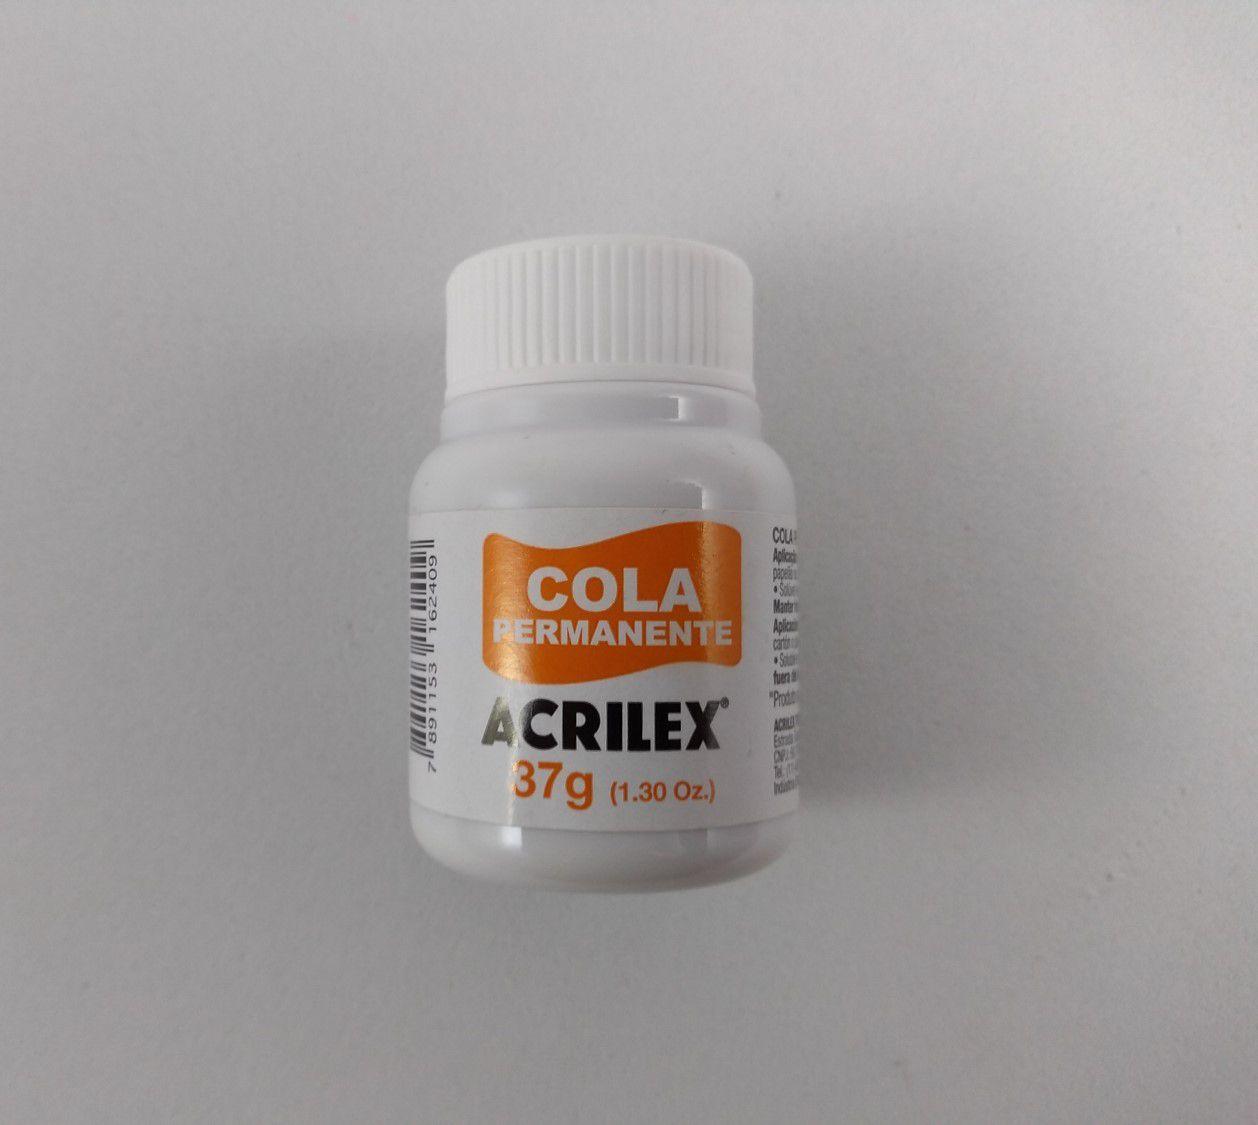 Cola Permamente Acrilex 37g unidade